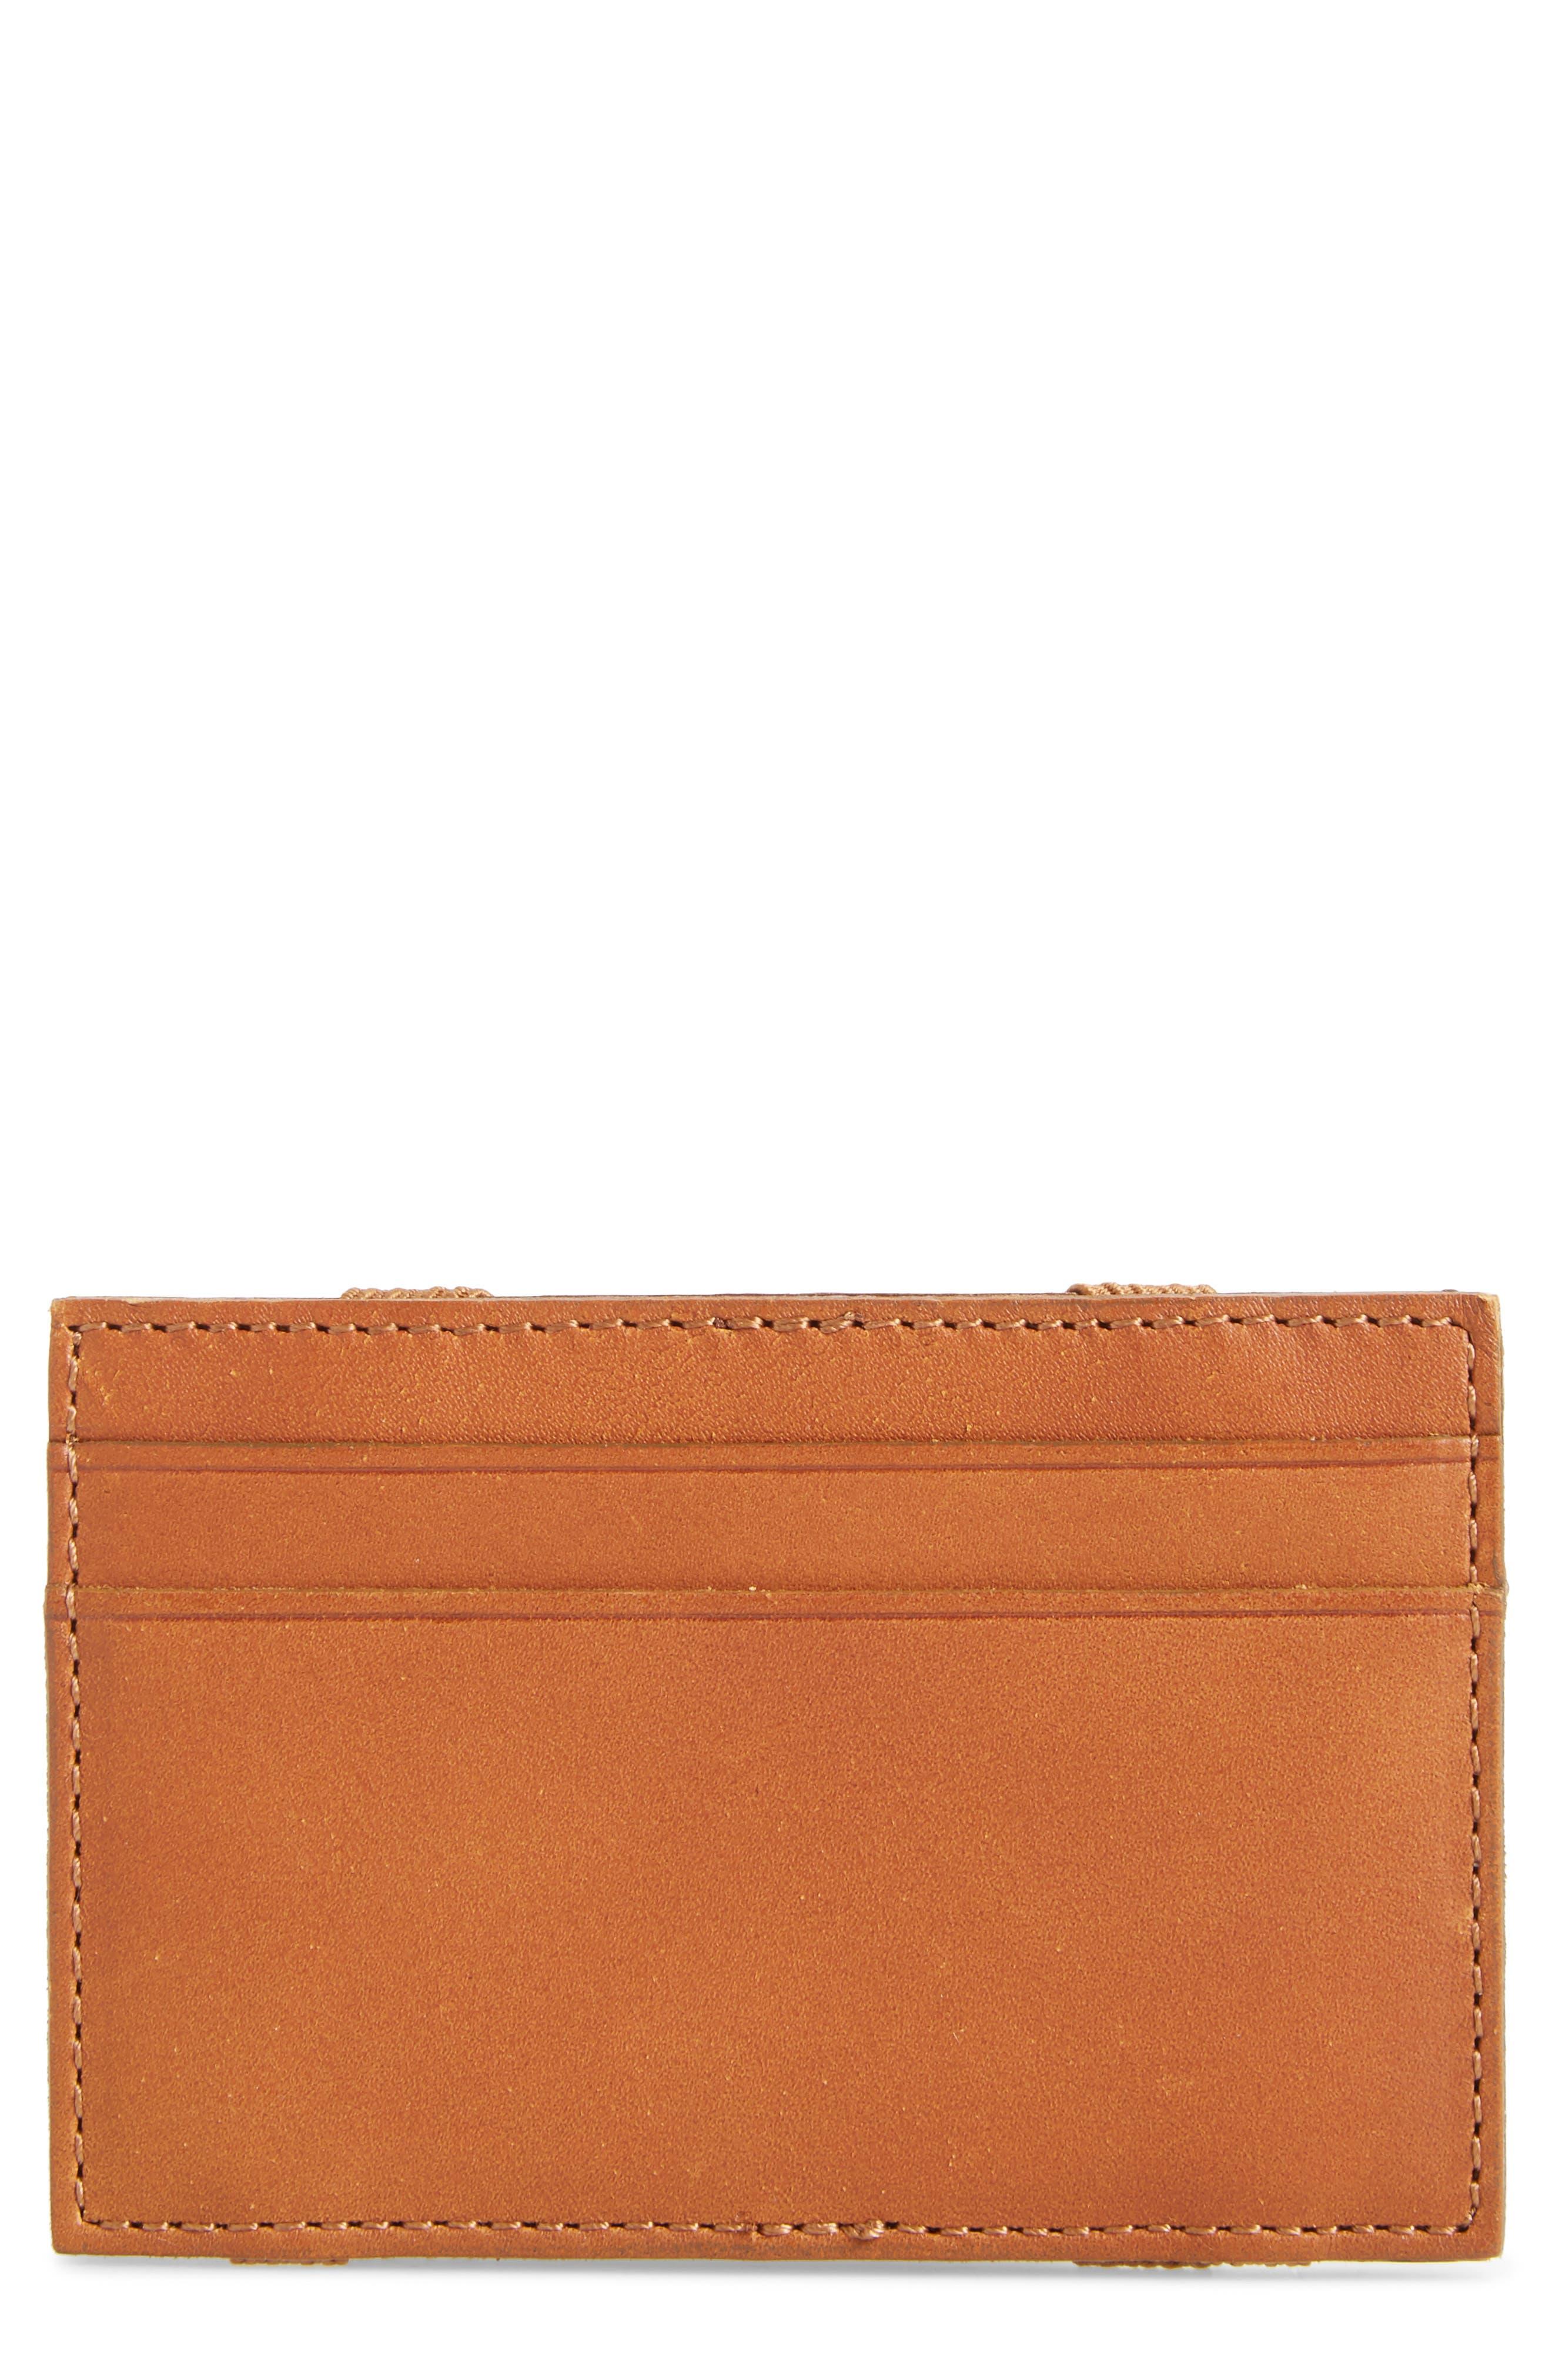 J.CREW,                             Magic Leather Wallet,                             Main thumbnail 1, color,                             200